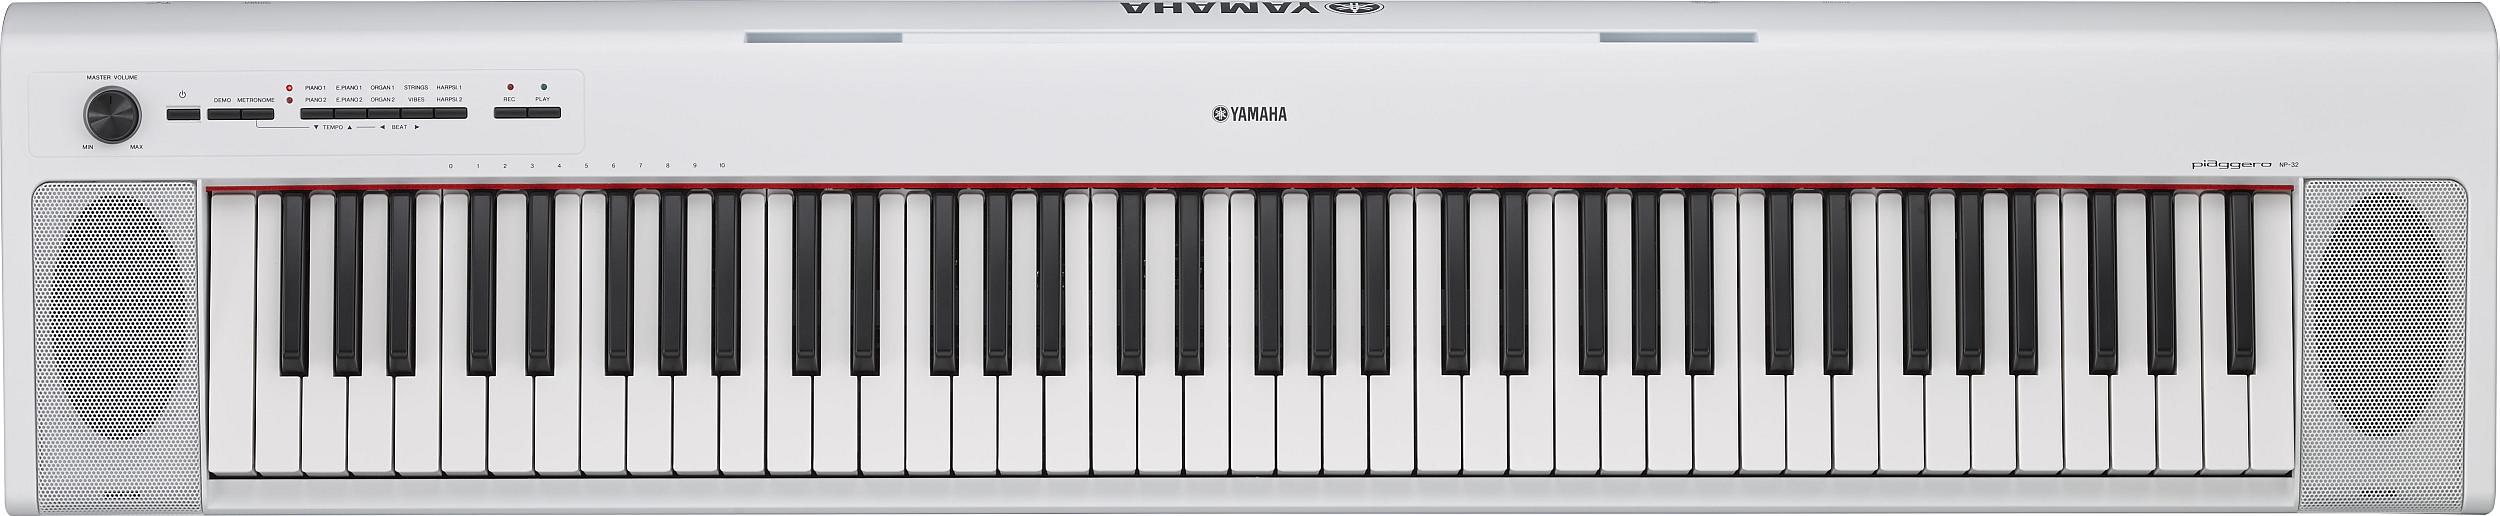 Yamaha NP-32WH Piaggero digitális színpadi zongora